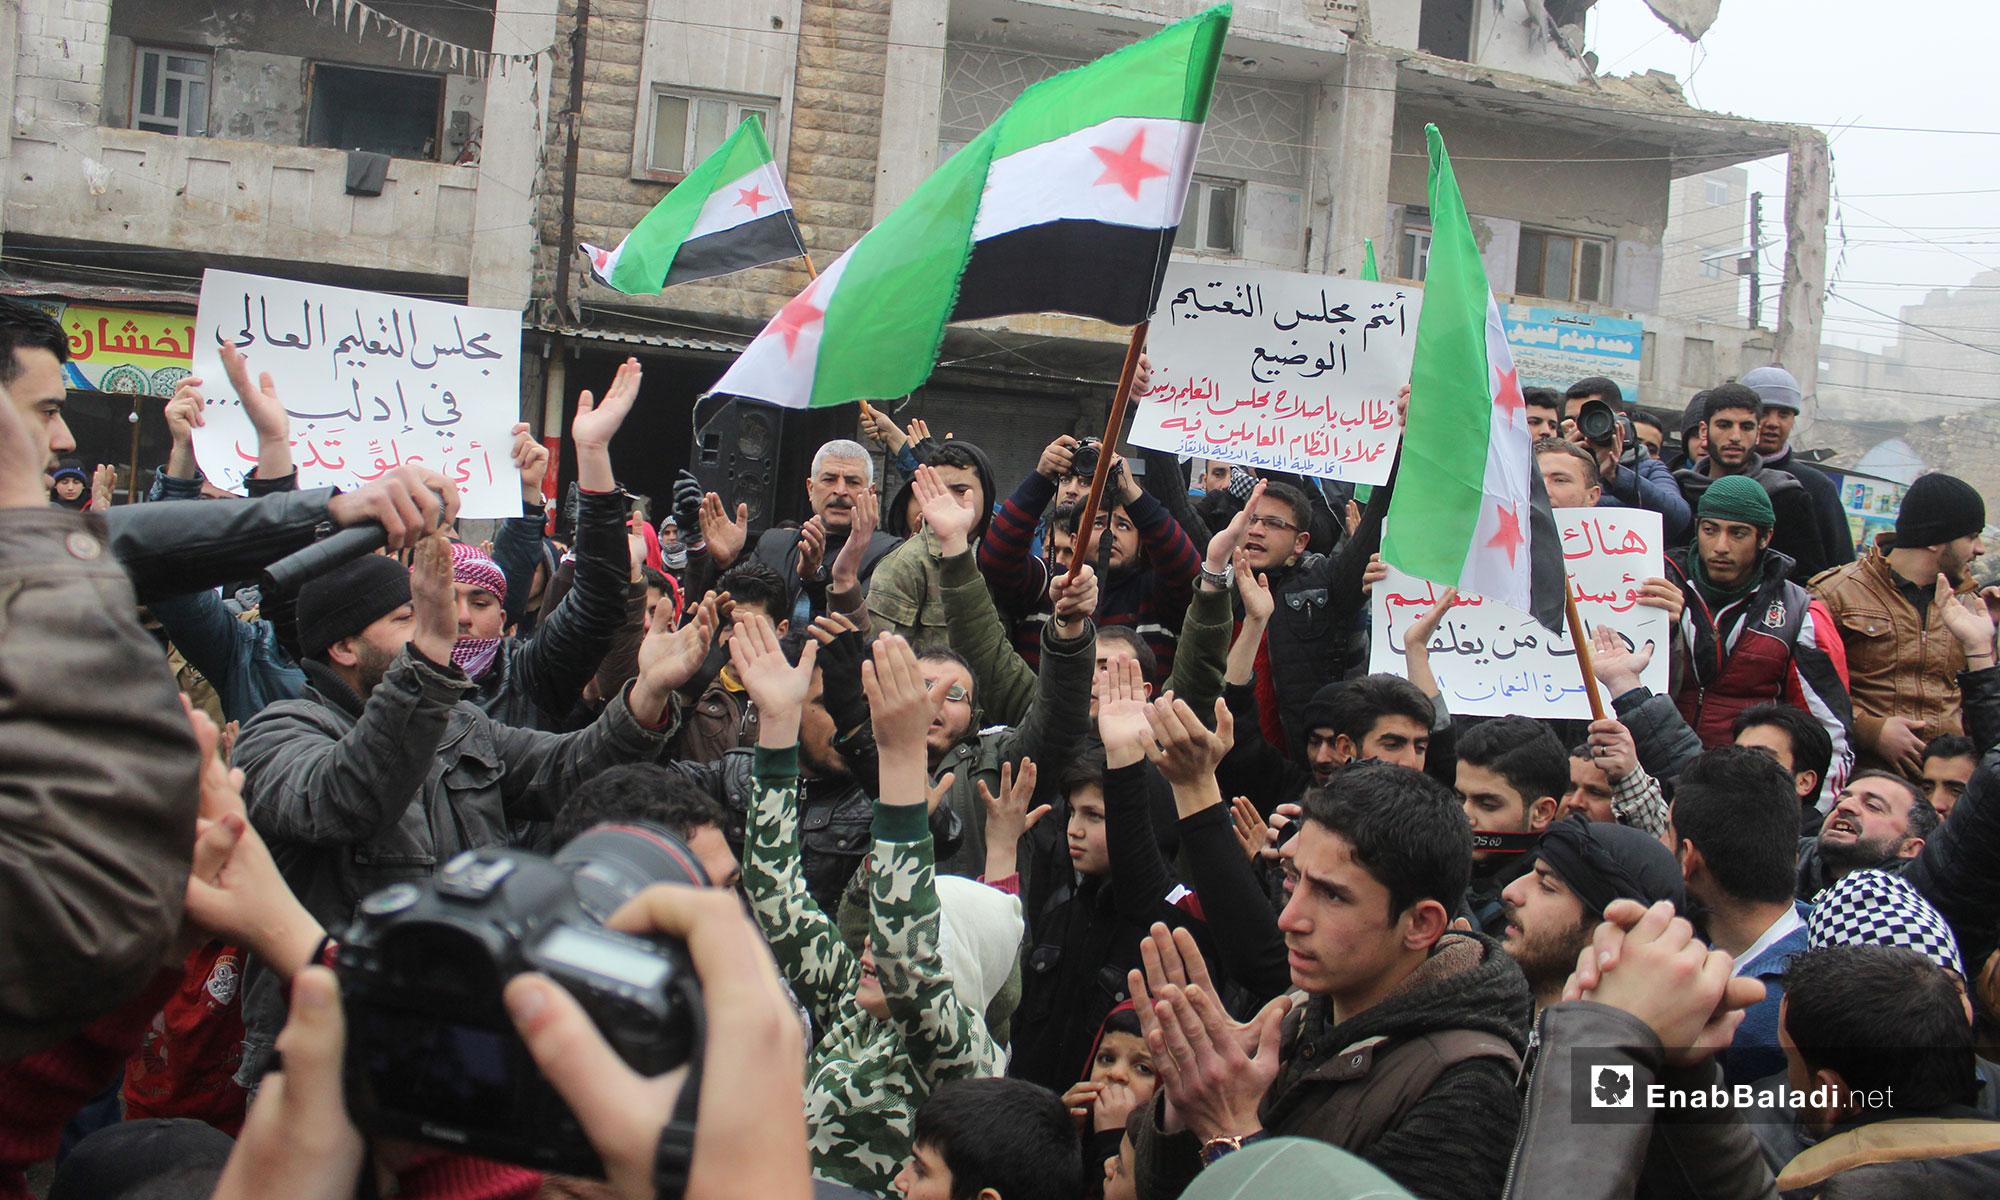 A demonstration in the city of Maarrat al-Nu